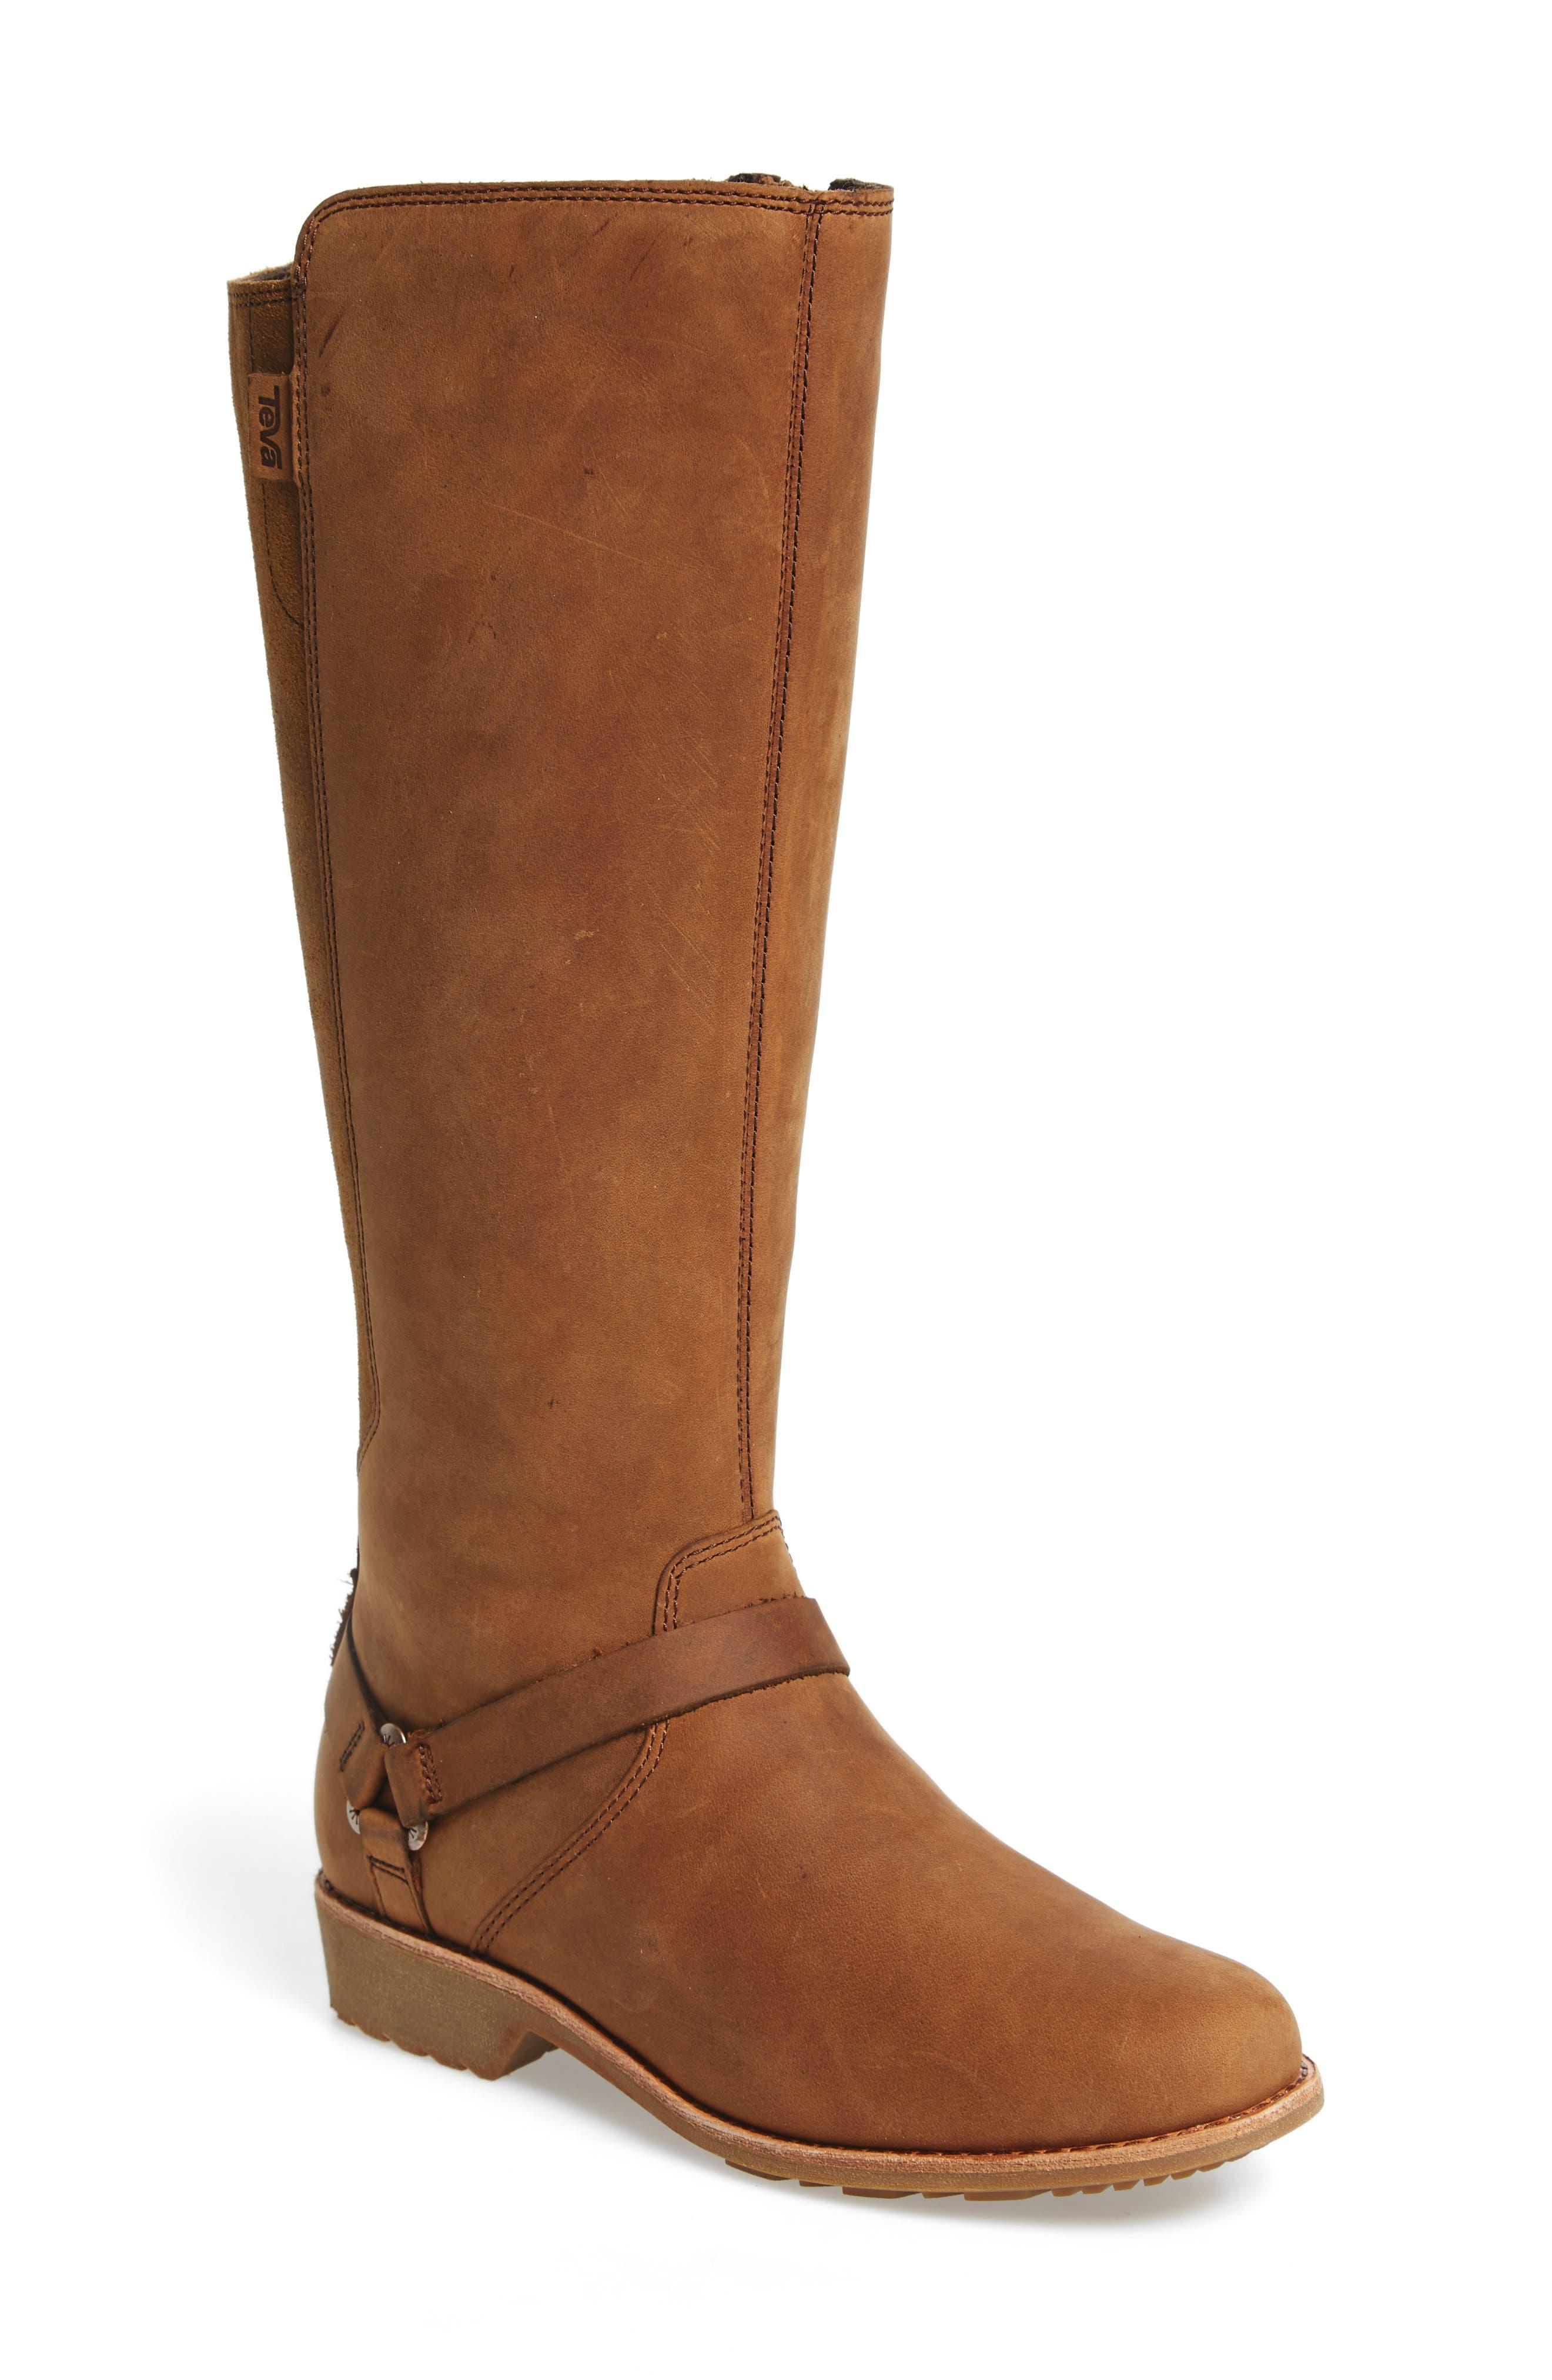 Alternate Image 1 Selected - Teva De La Vina Waterproof Boot (Women)